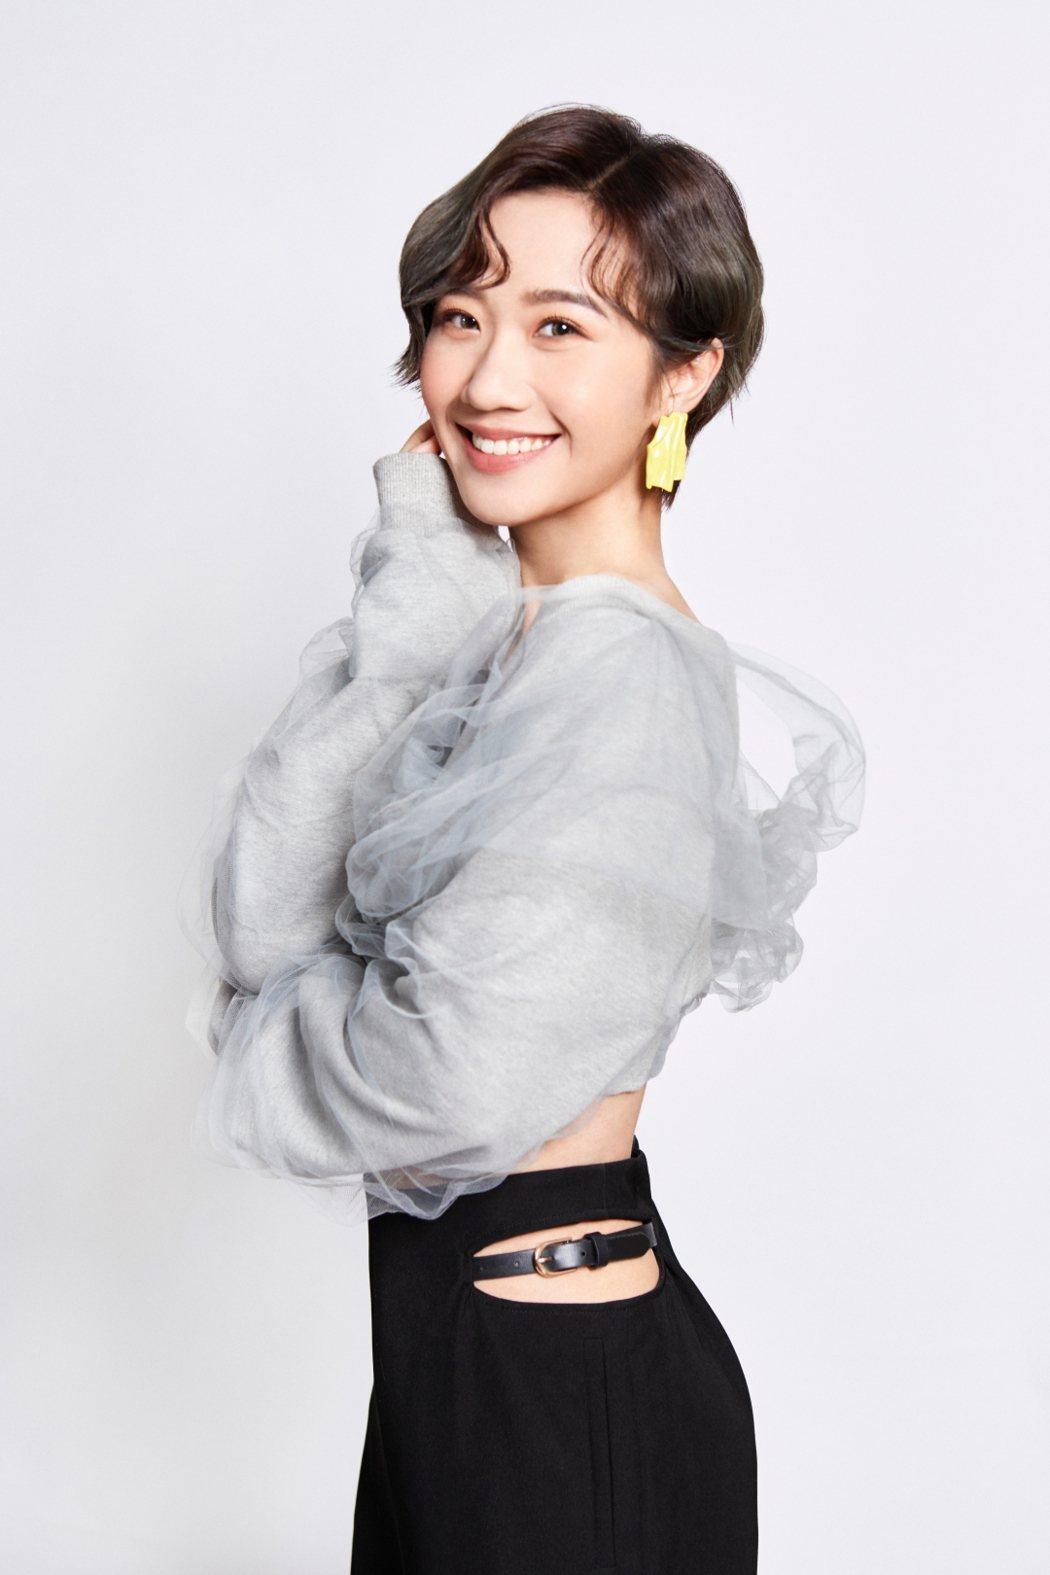 Lulu將三度主持KKBOX音樂風雲榜頒獎典禮。圖/KKBOX提供